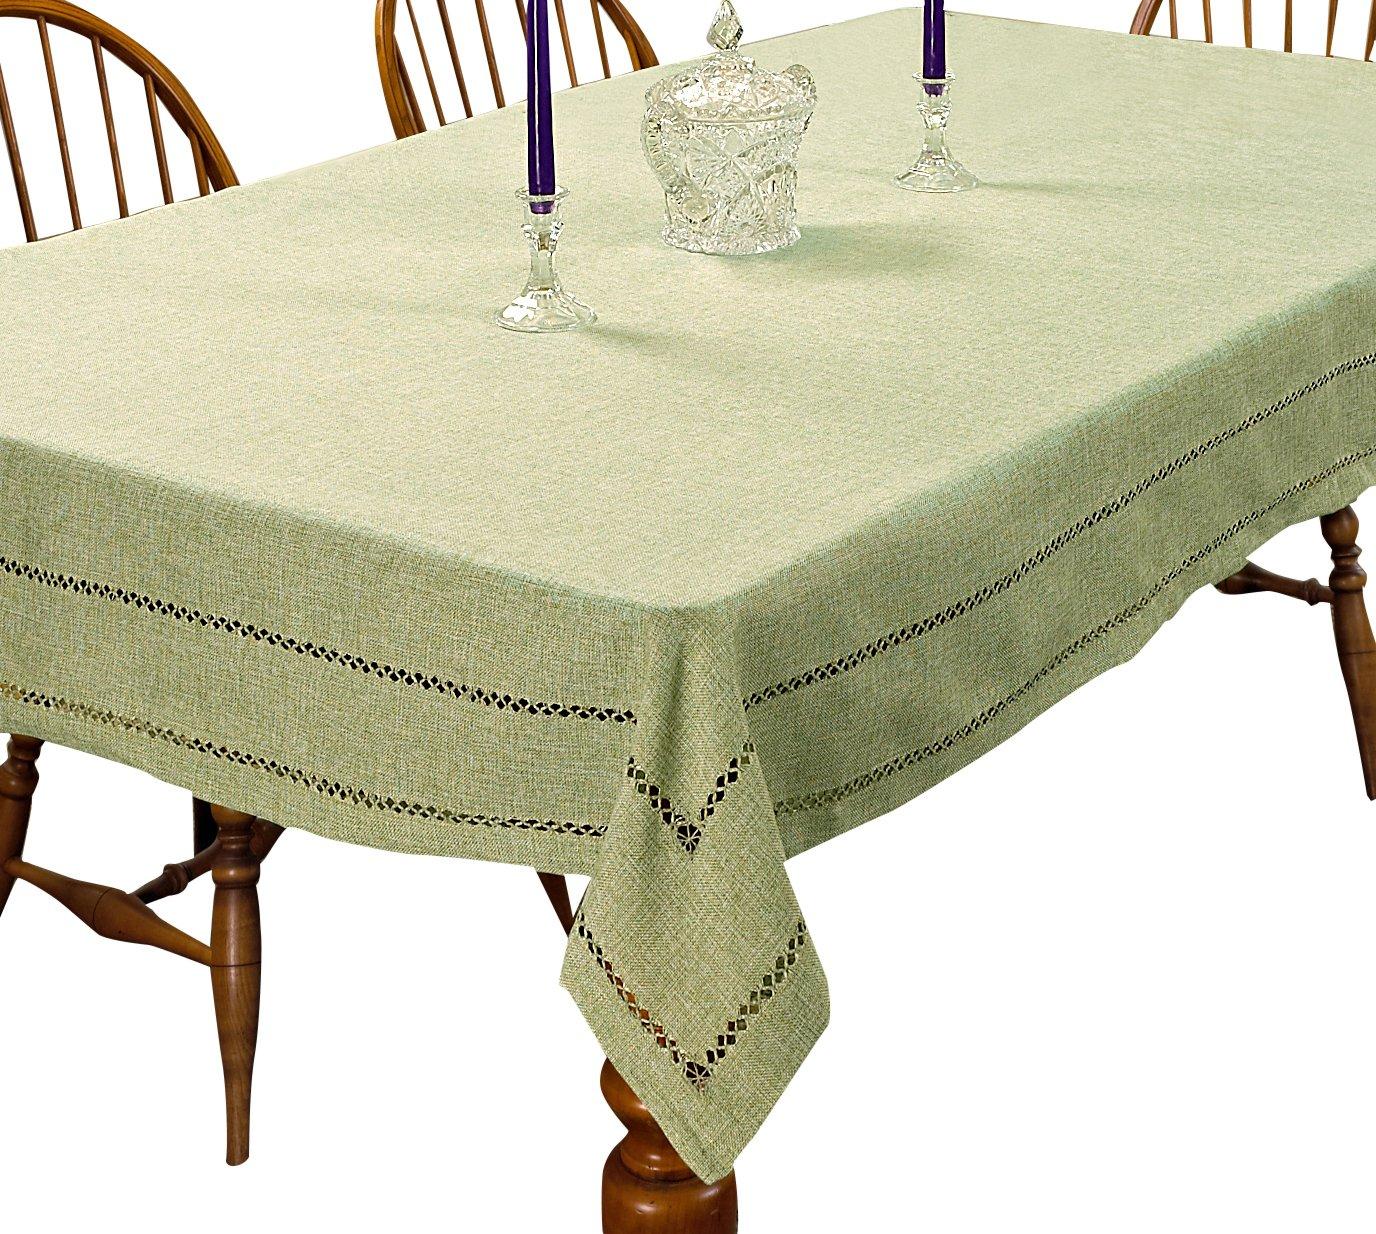 Violet Linen Hem Stitch Embroidered Vintage Design Oblong//Rectangle Tablecloth 60 X 84 Blue HEM STITCH BL-4